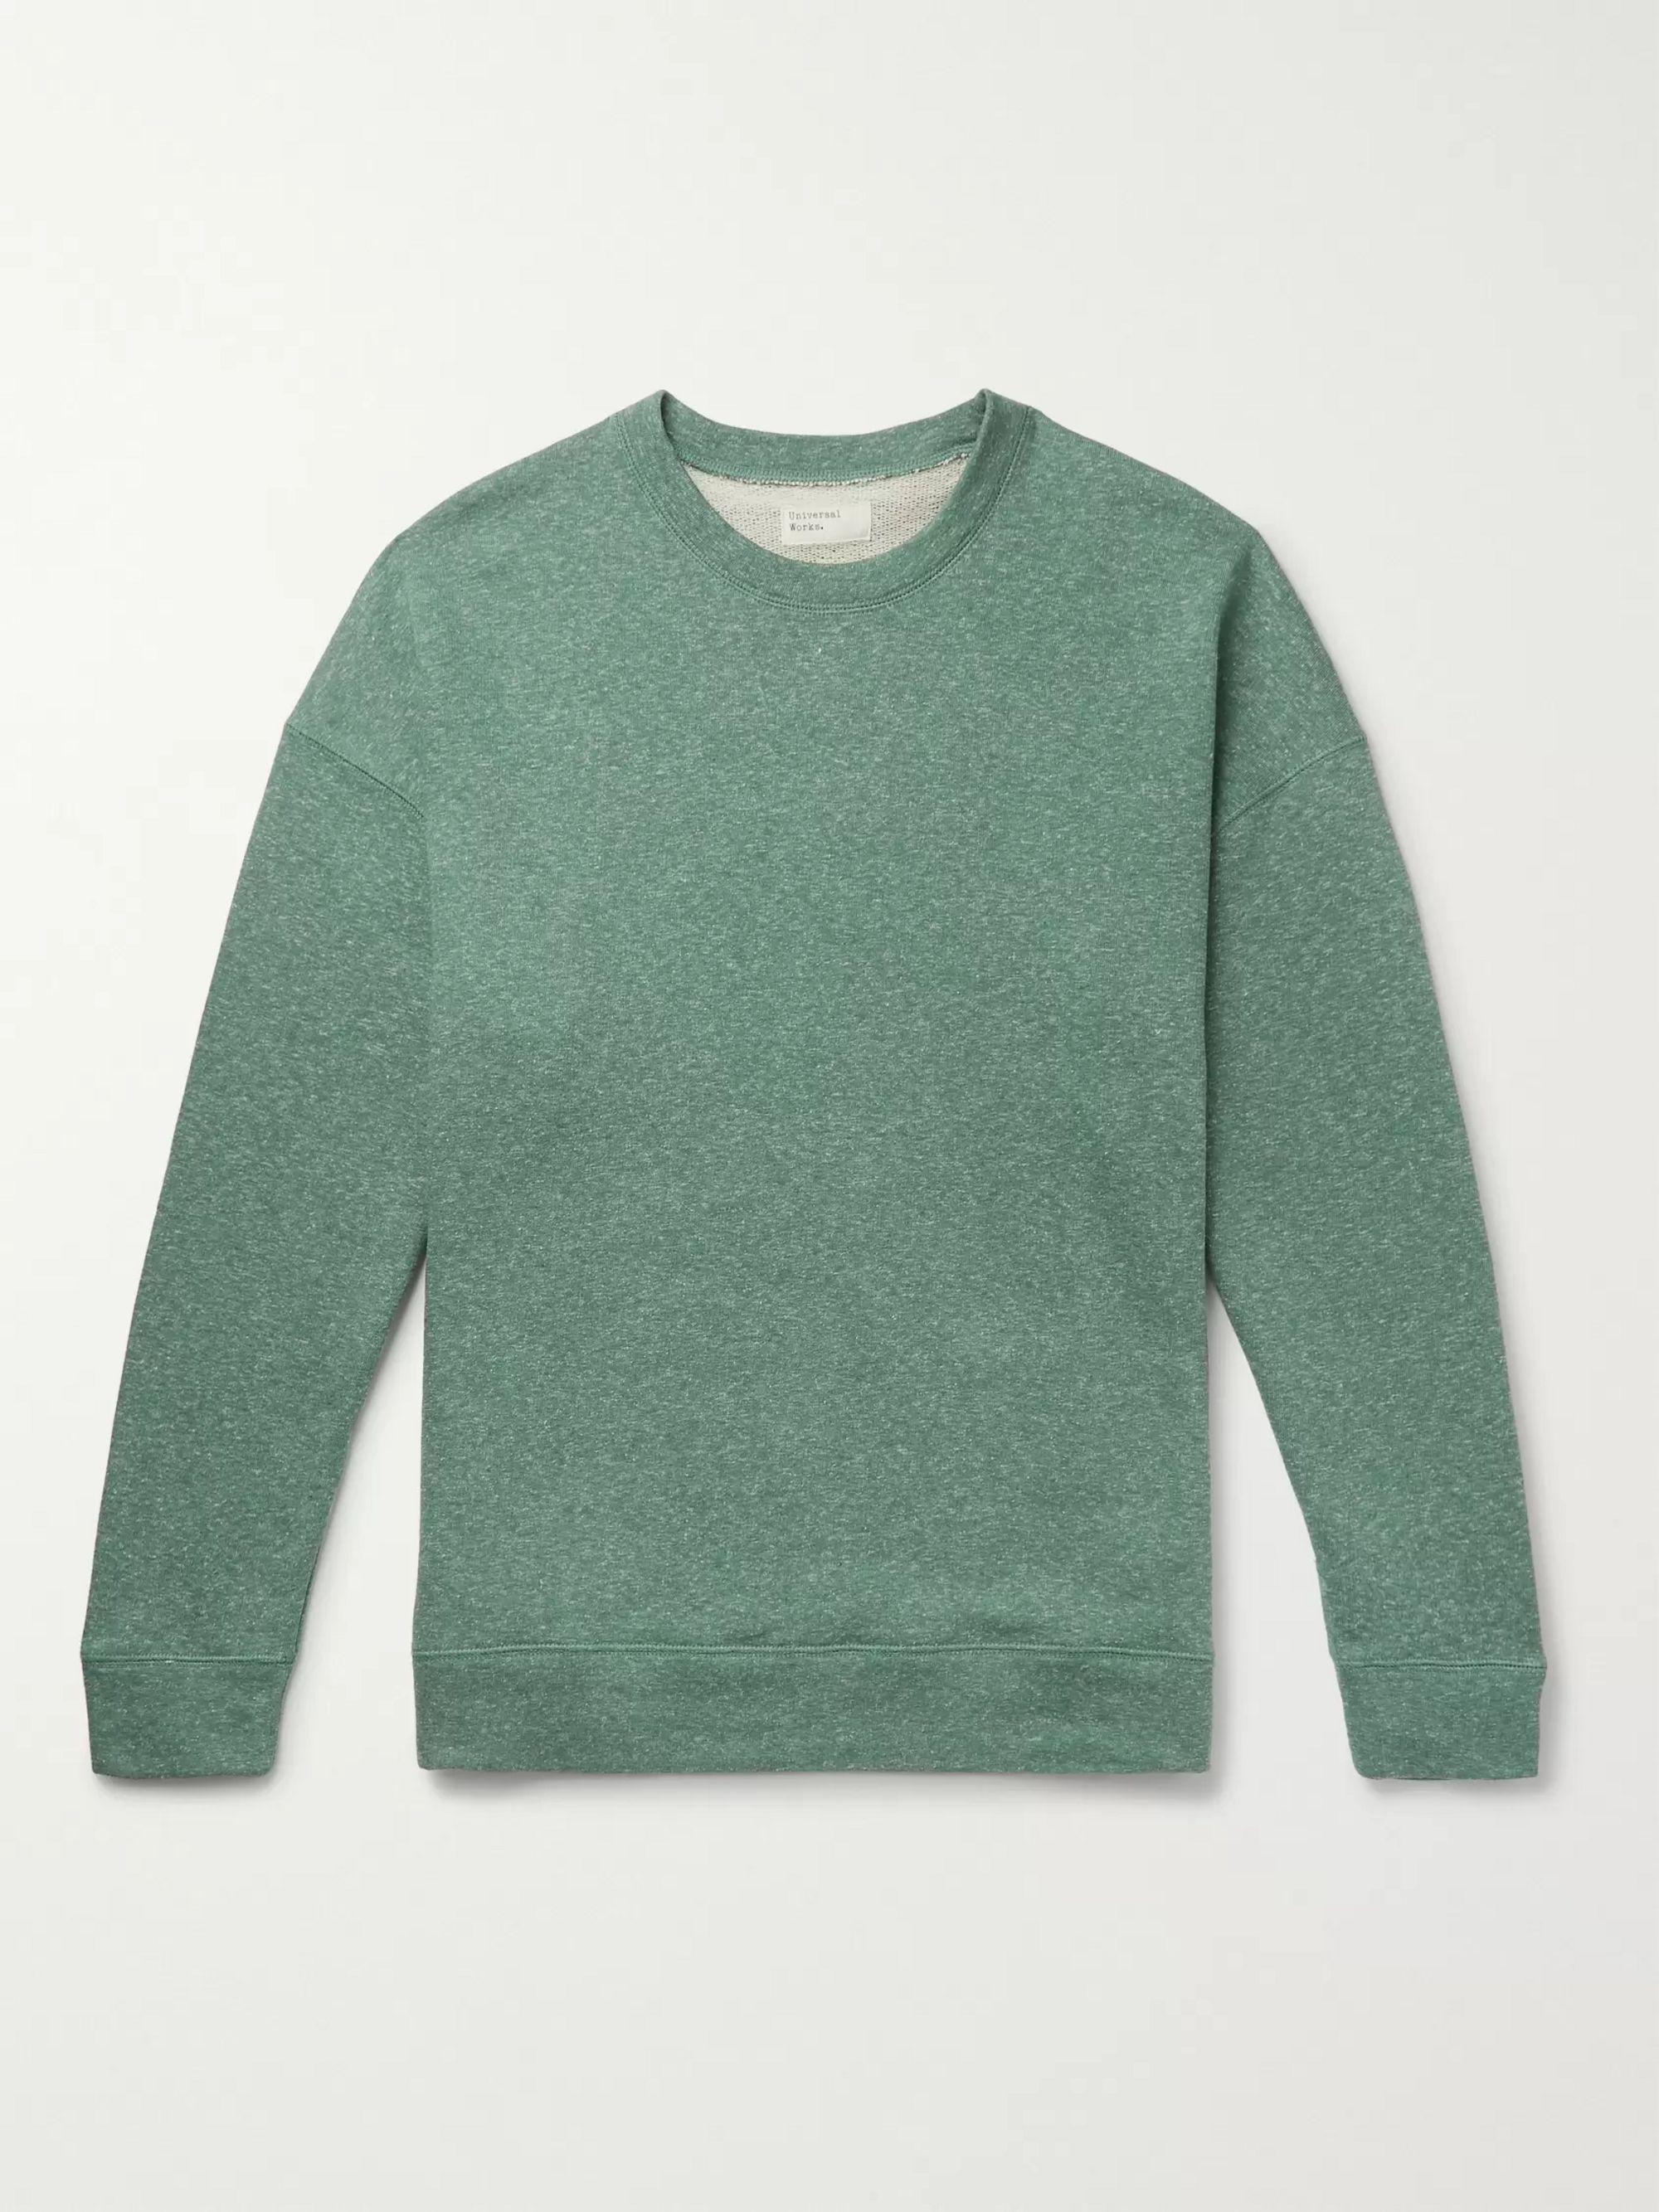 Oversized Mélange Loopback Cotton Blend Jersey Sweatshirt